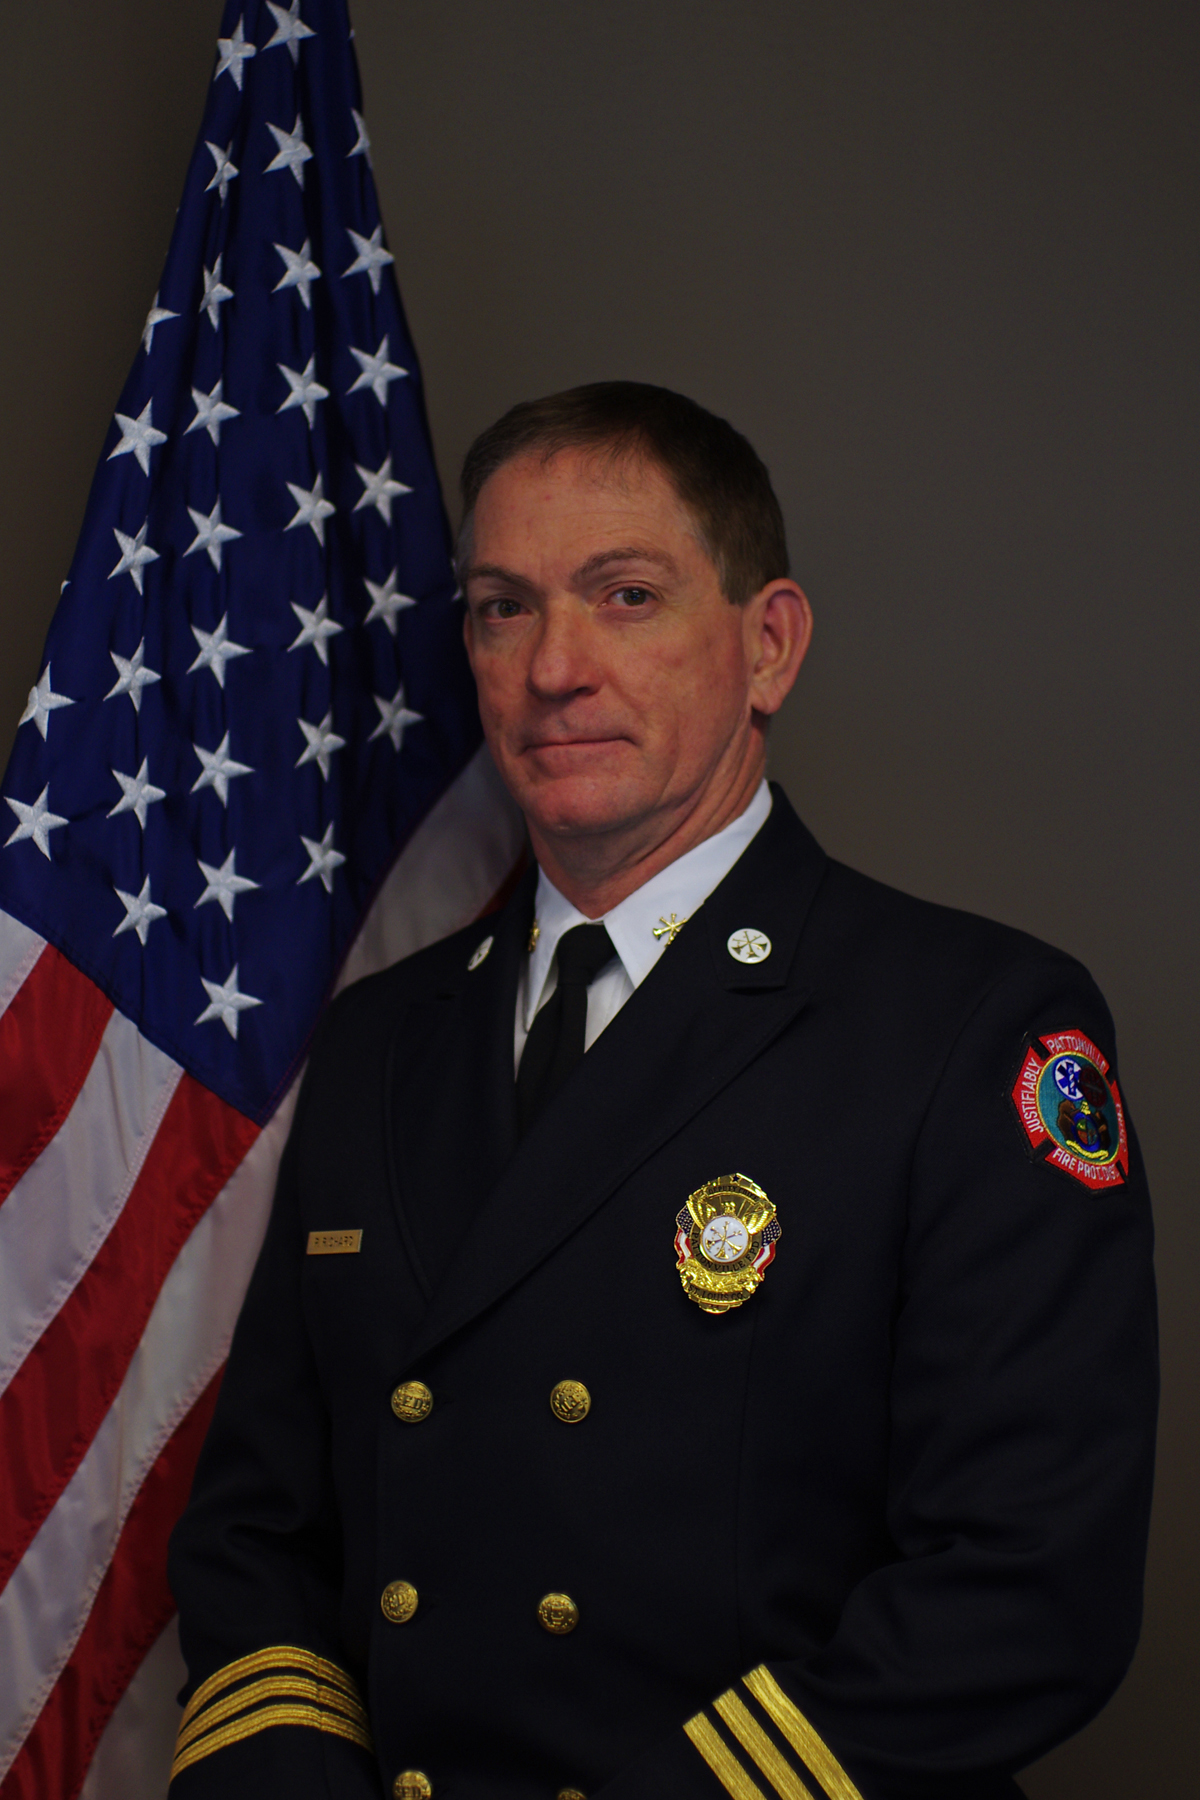 Deputy Chief-Fire Marshal Paul Richard